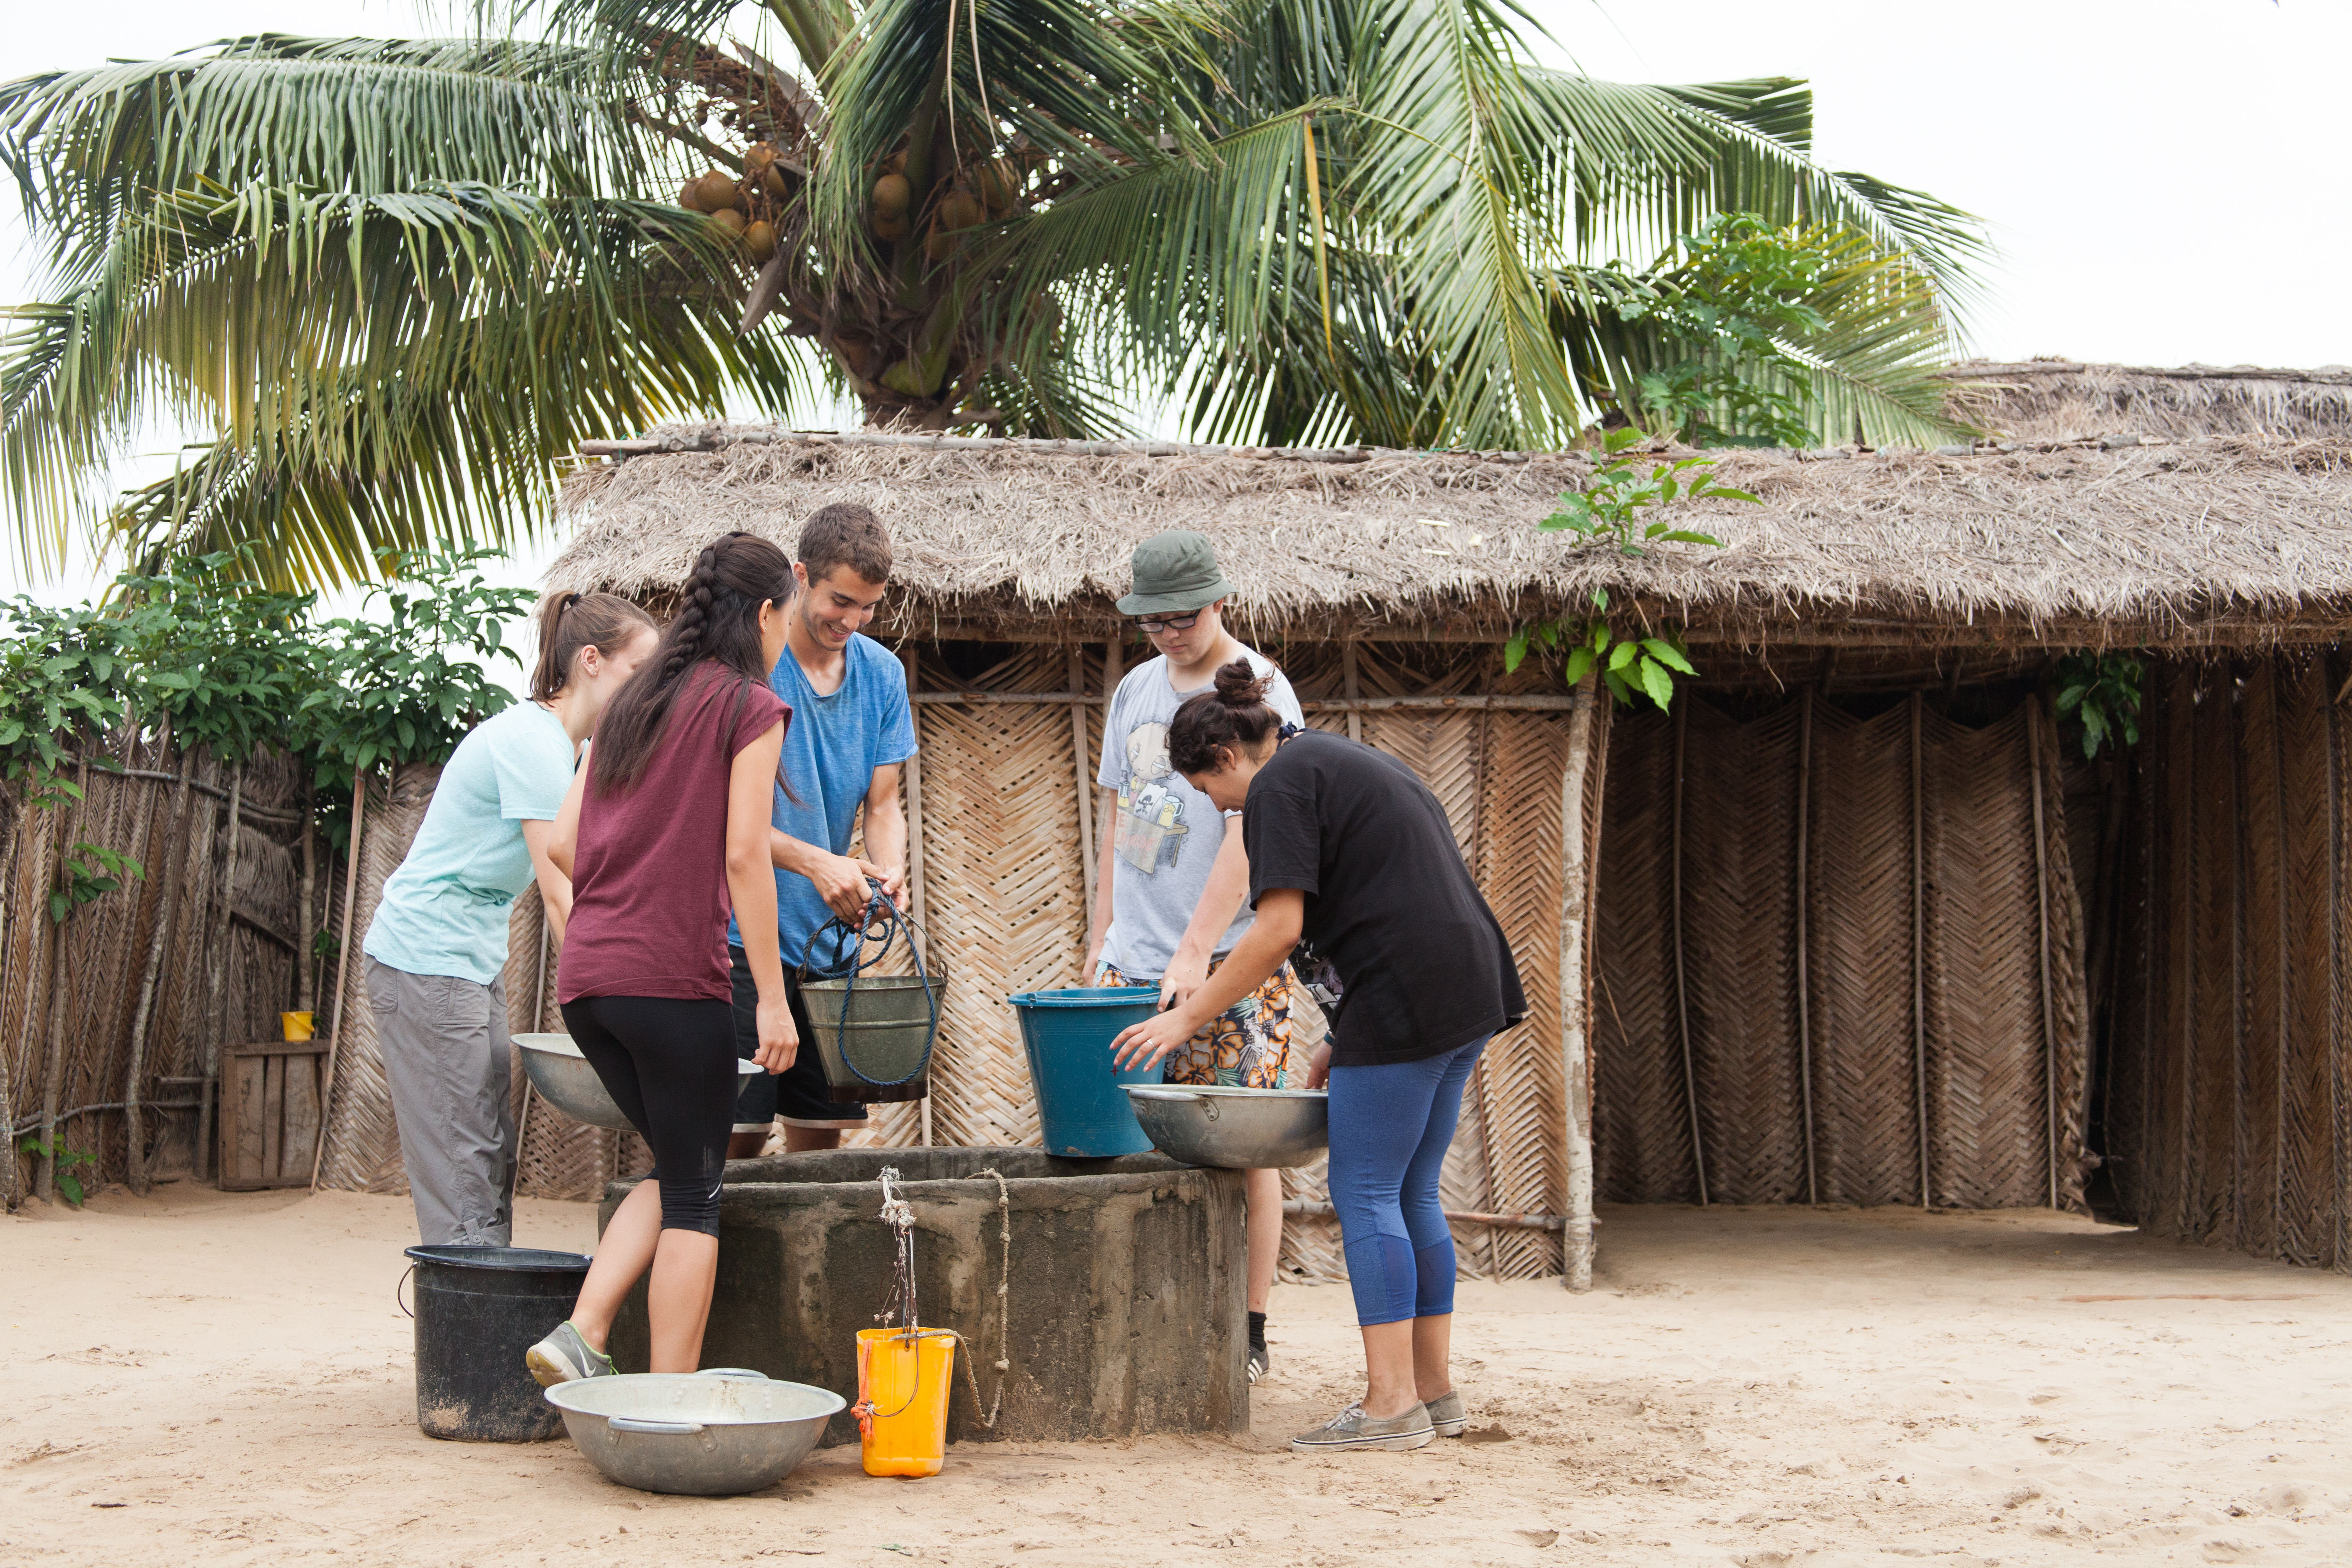 Summer Program - Travel And Tourism | Global Leadership Adventures: Ghana - Building Healthy Villages